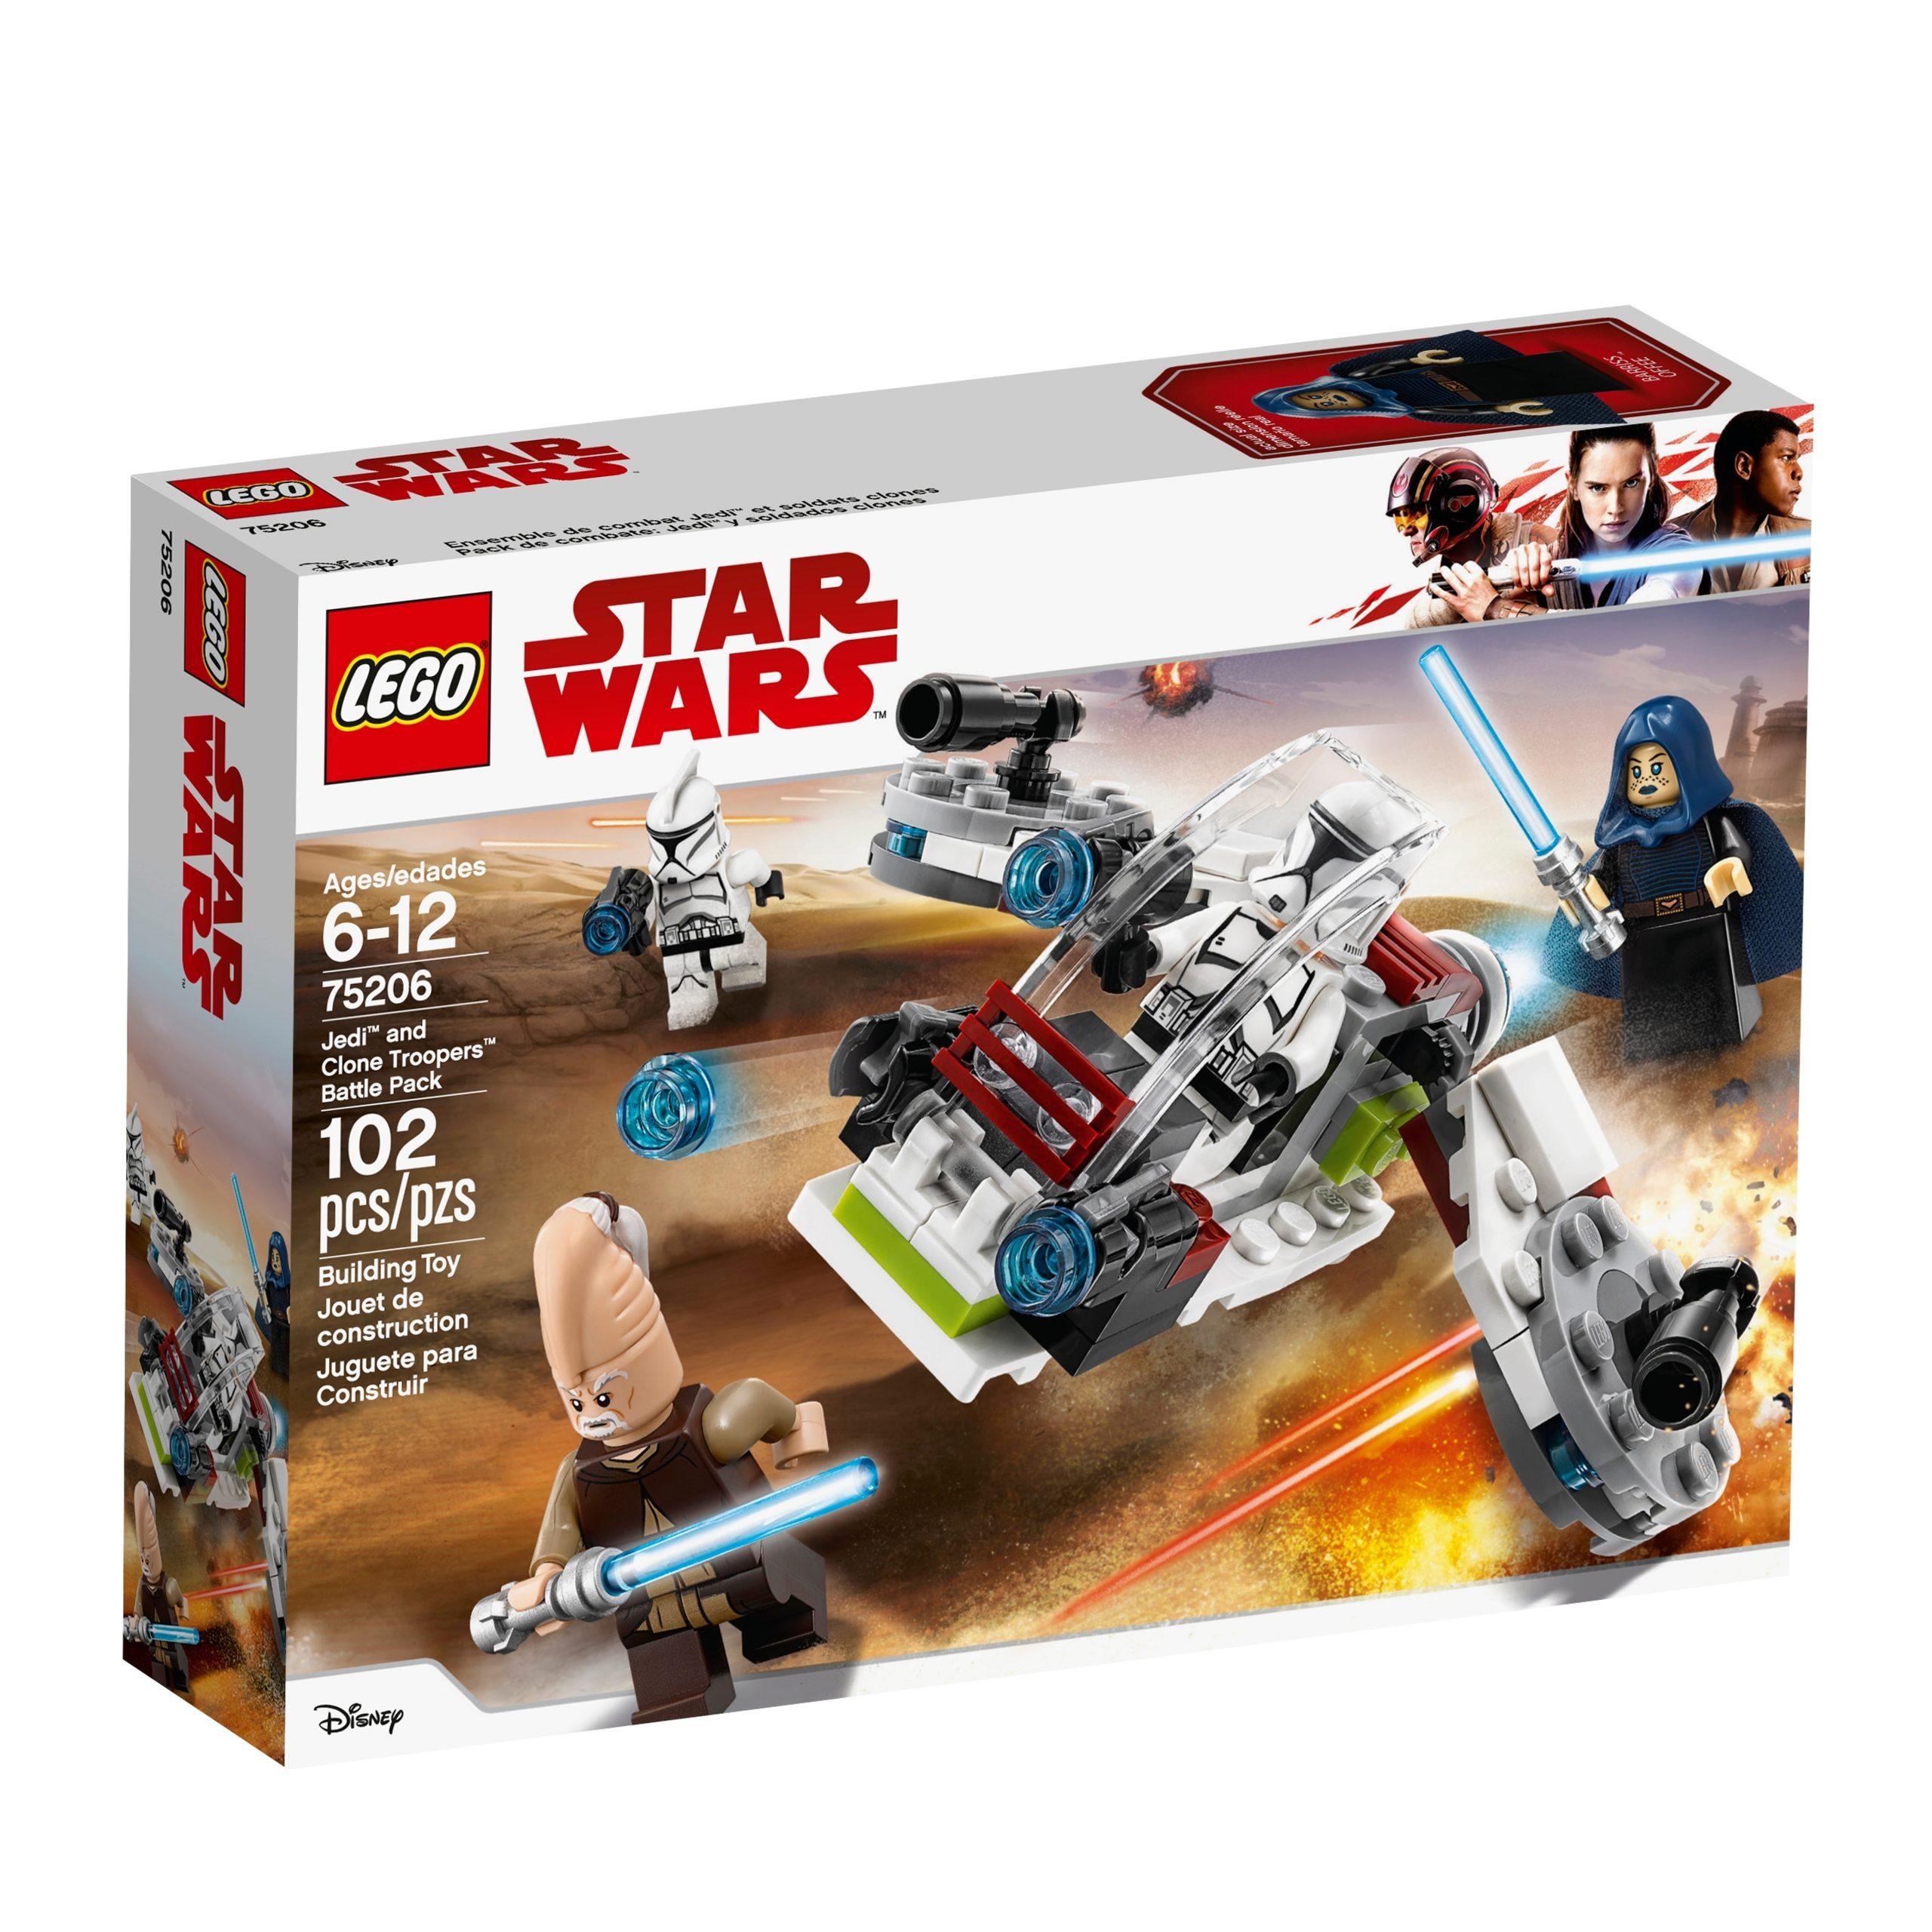 lego 75206 jedi und clone troopers battle pack scaled